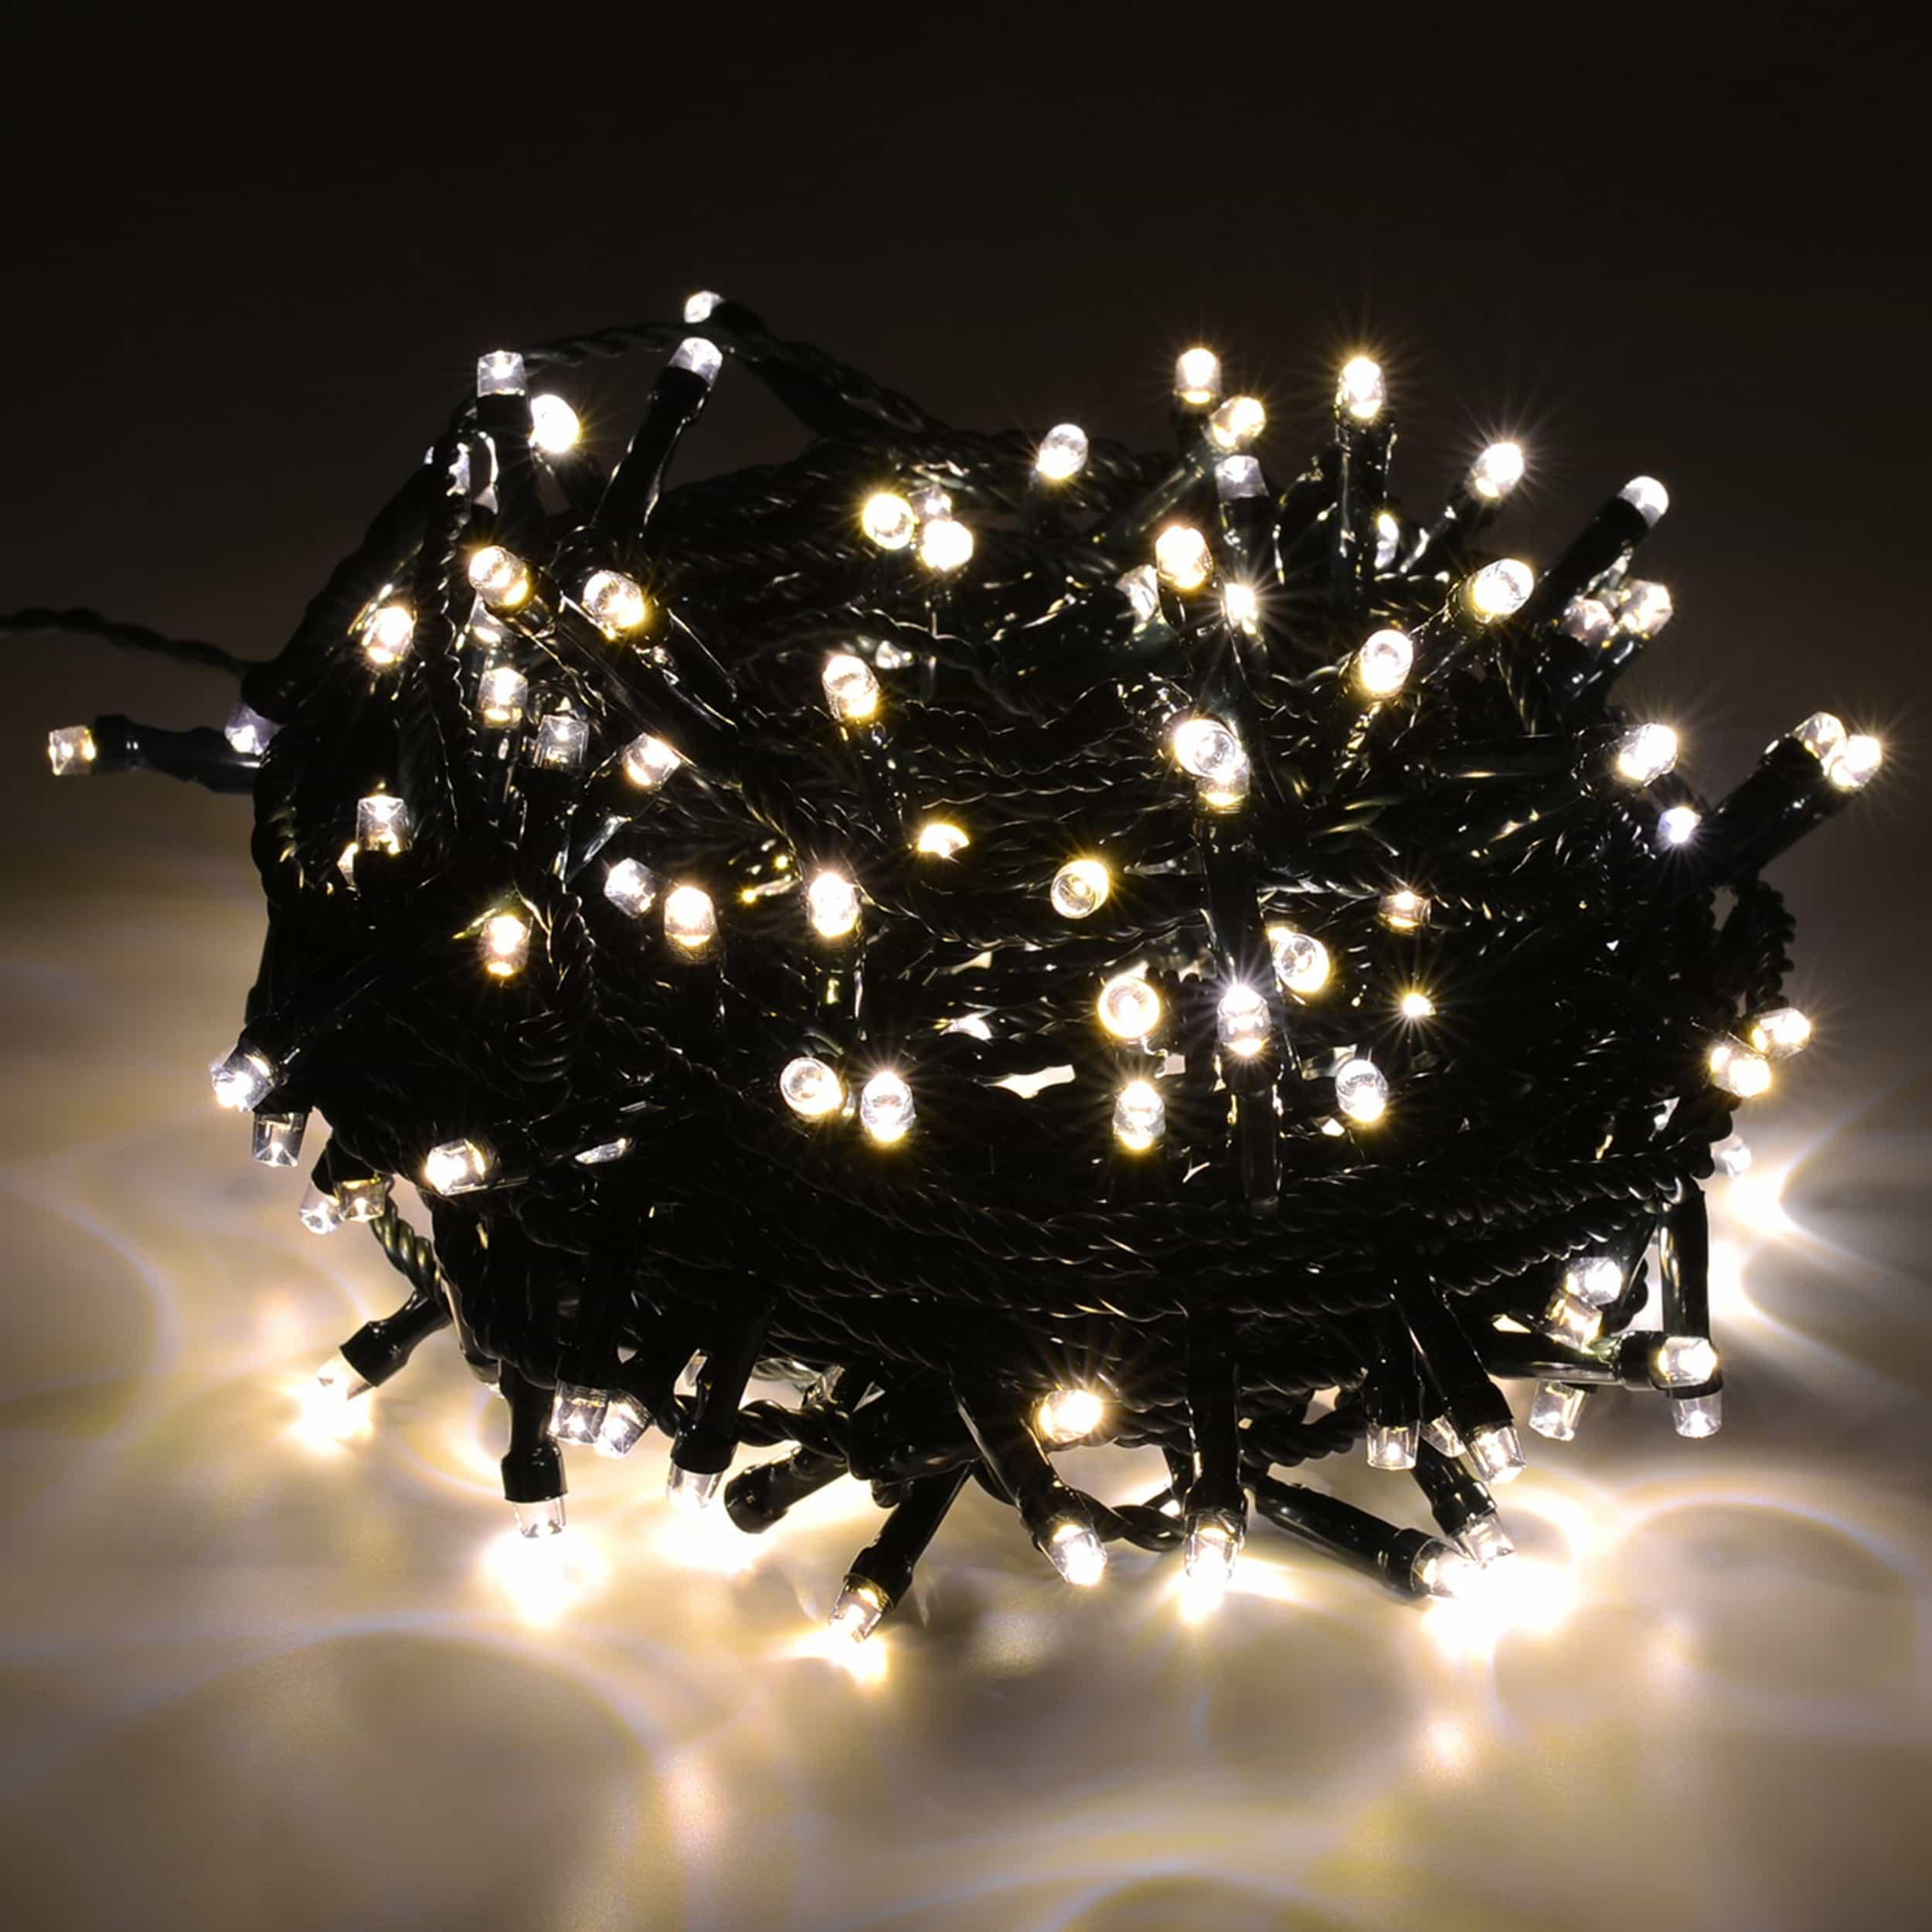 LED Lichterkette 100 LED energiesparend L5m warmweiß